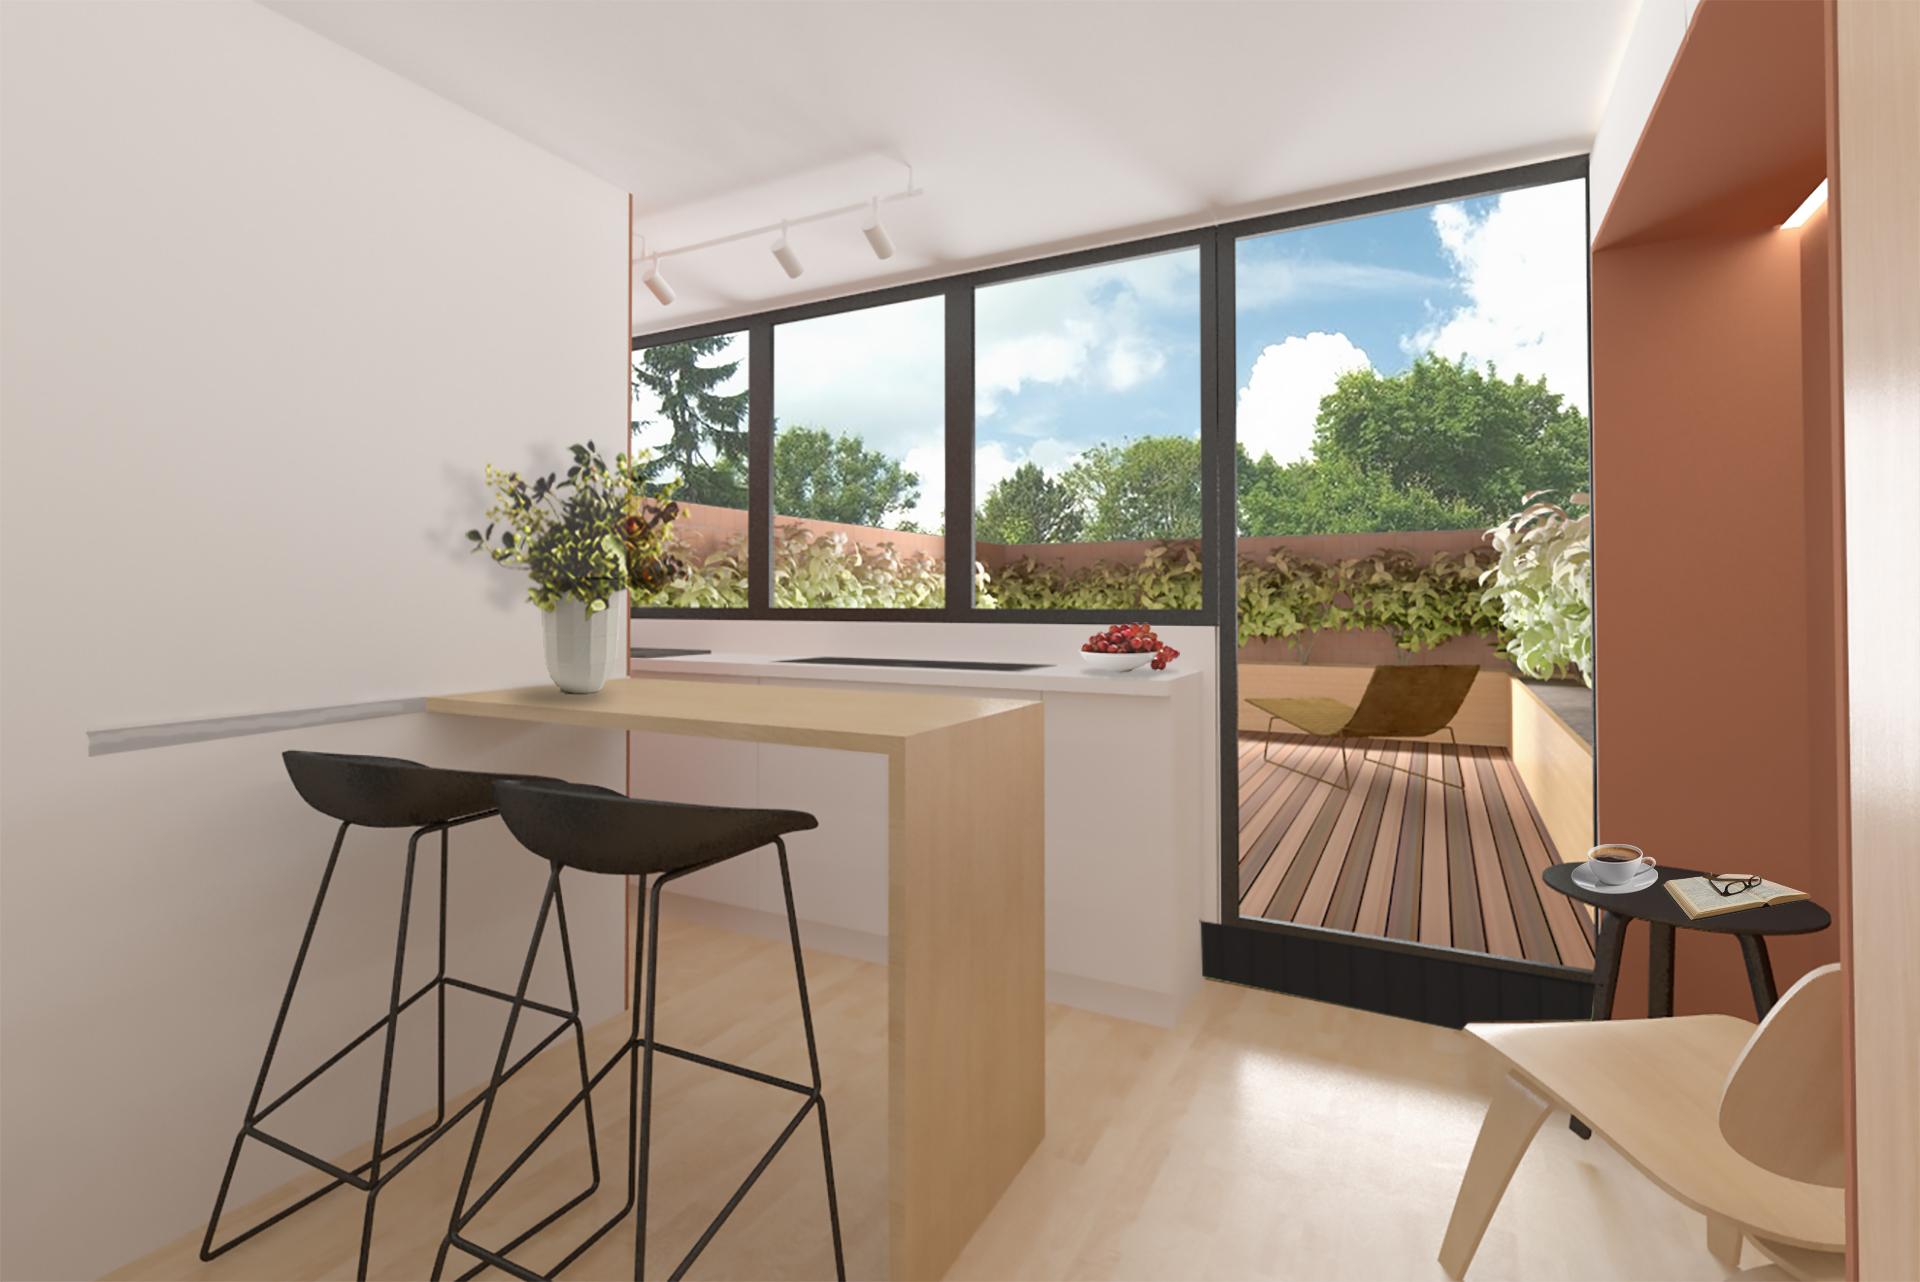 Mini Apartment Olha Martsynovska Interior Design